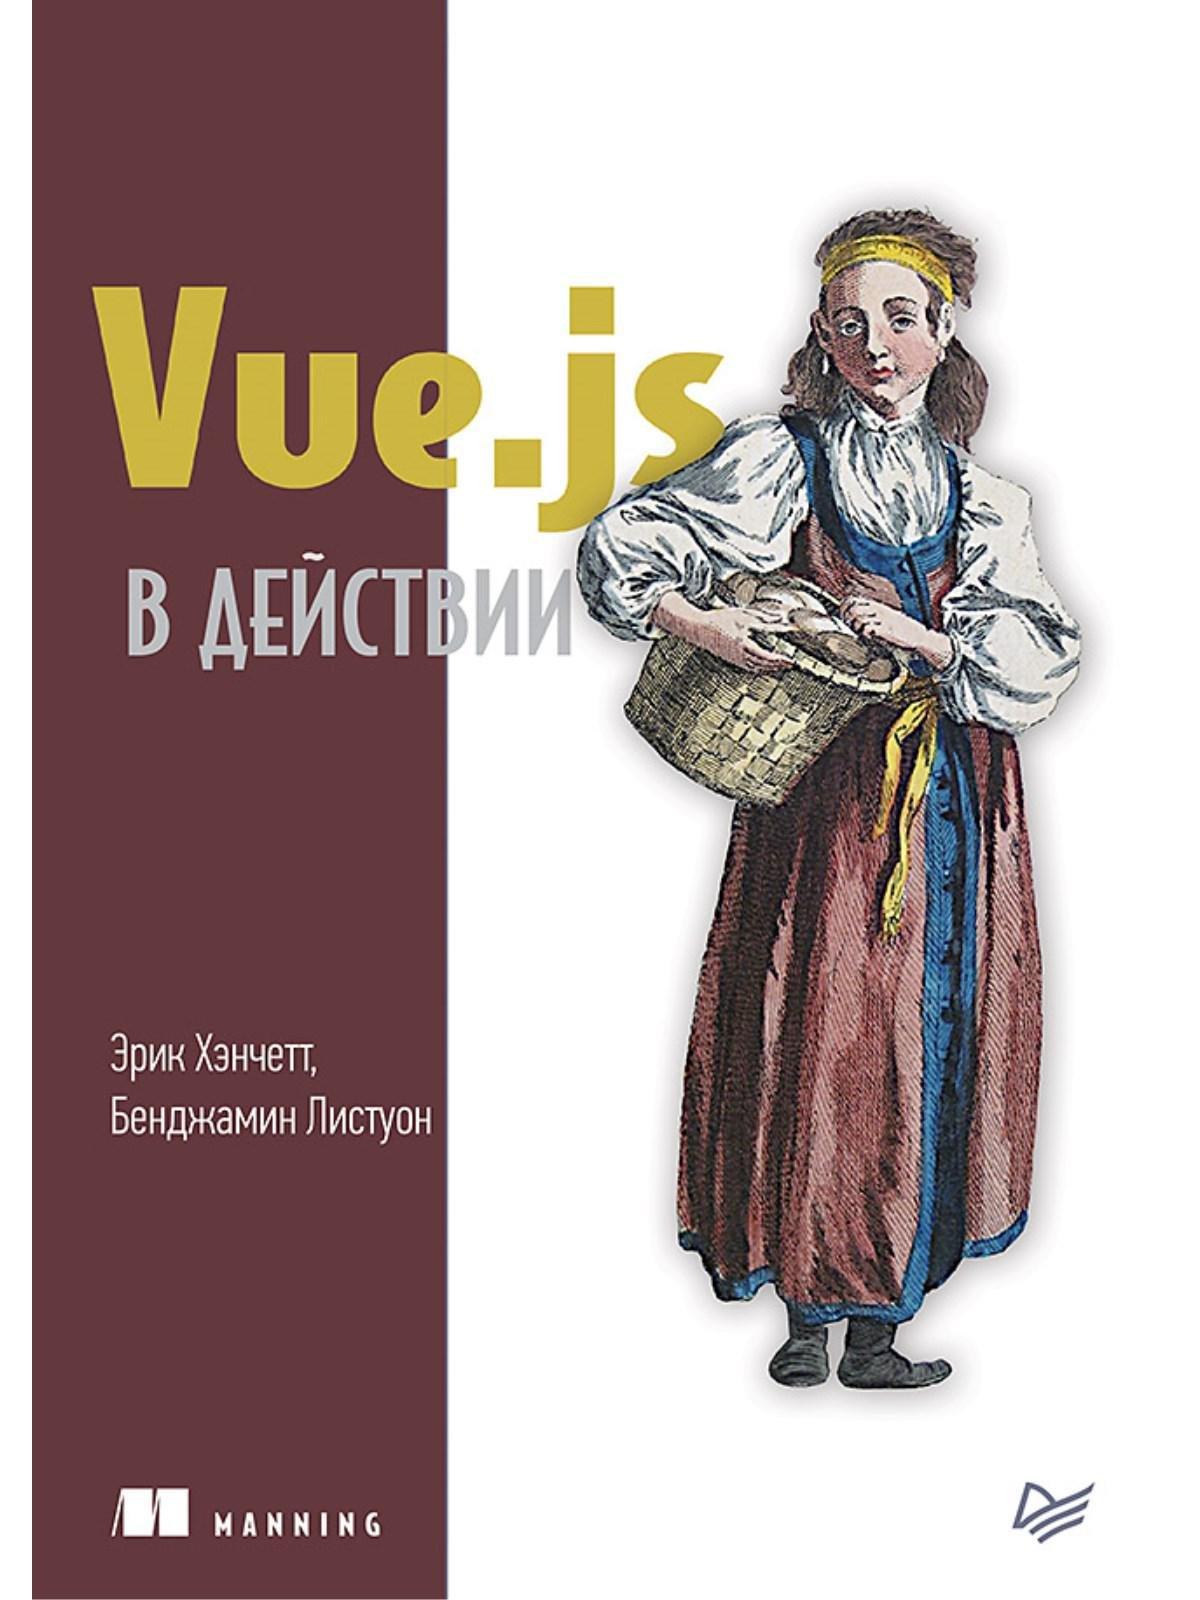 Без Автора Vue.js в действии д хеллер розен разрушение традиции об александрийской библиотеке